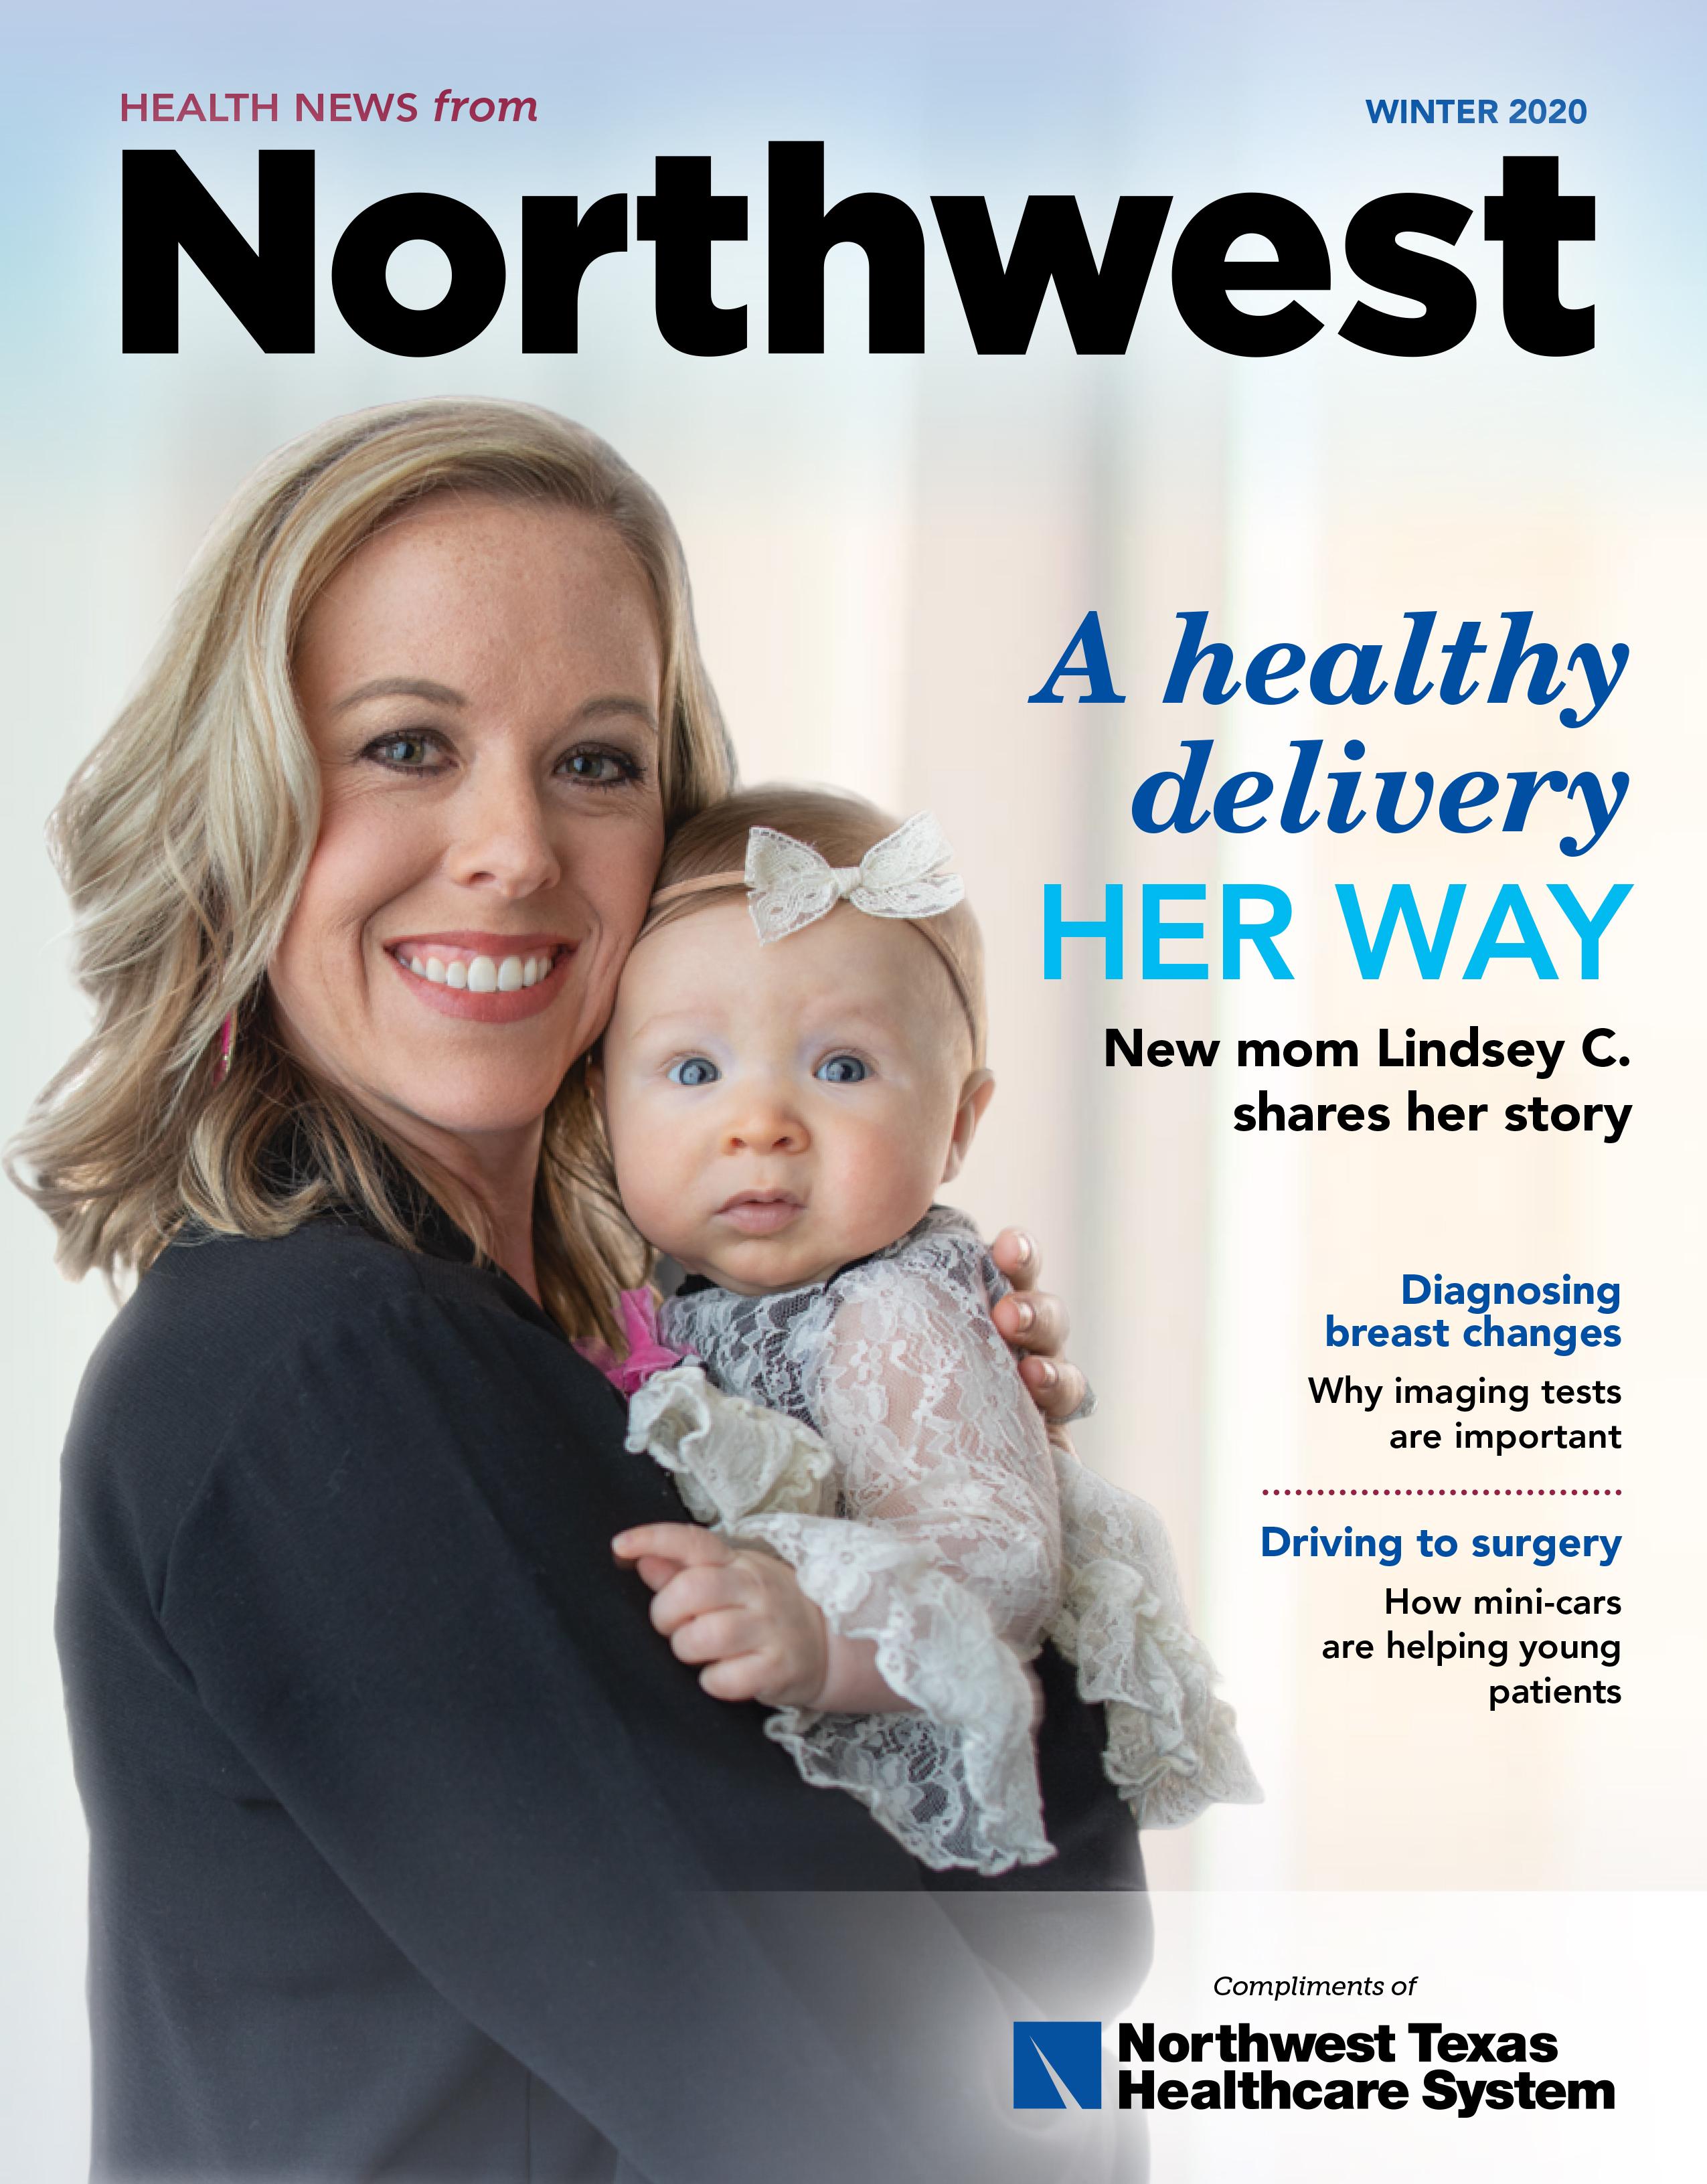 NWTHS Health News Magazine Winter 2020